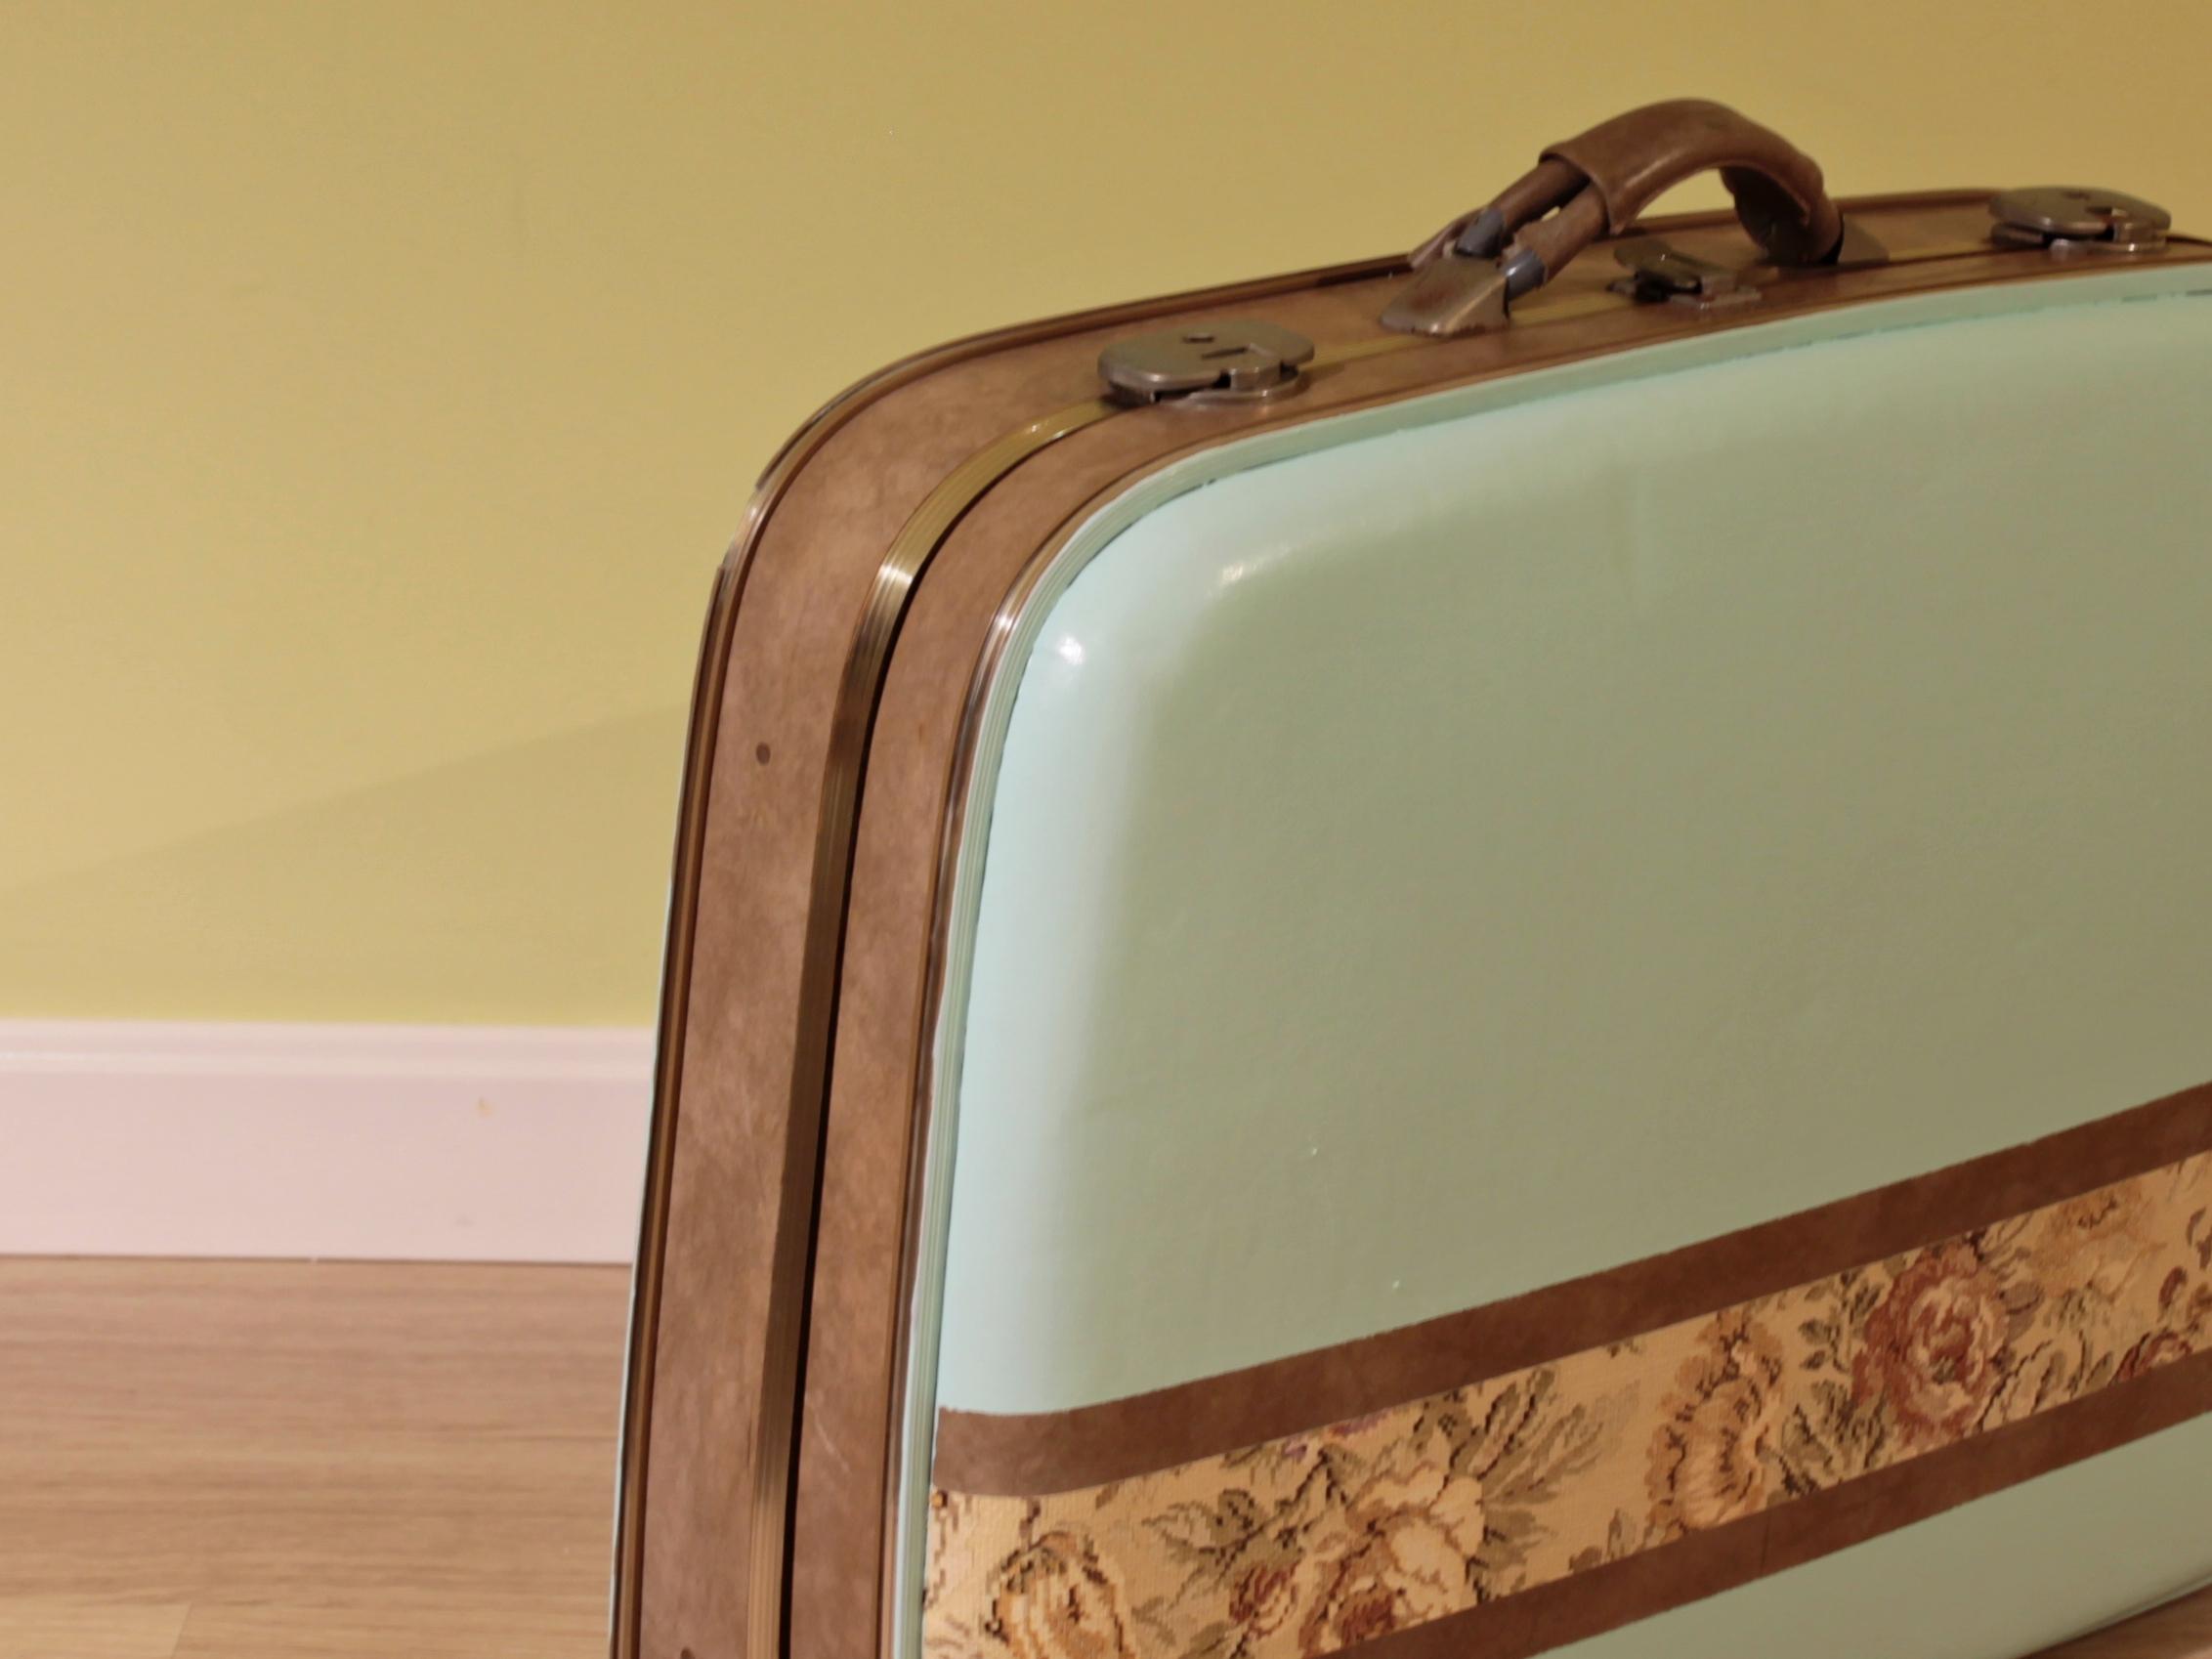 de maleta retro a super retro missoluciones-pángala